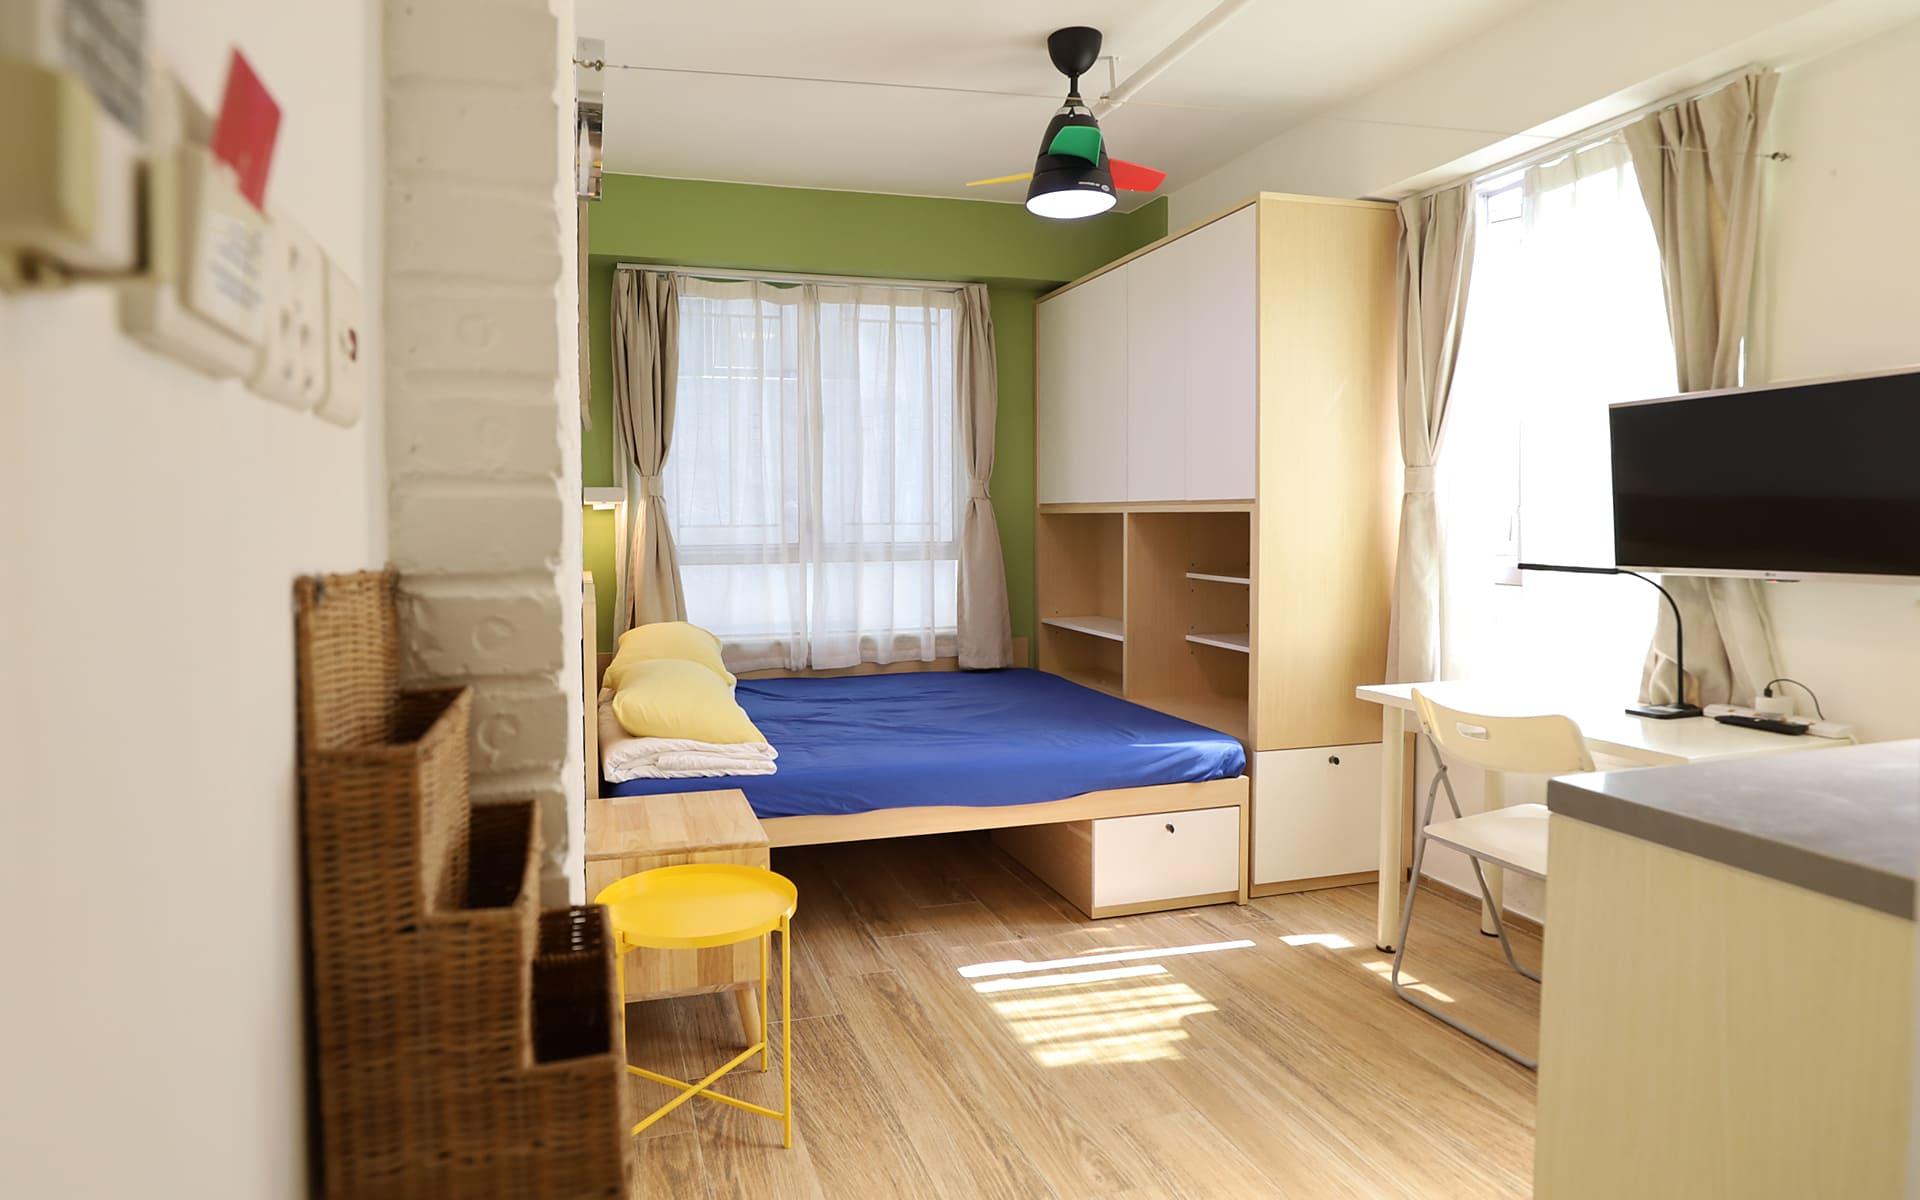 hk_service_apartment_1263465101613534263.jpg